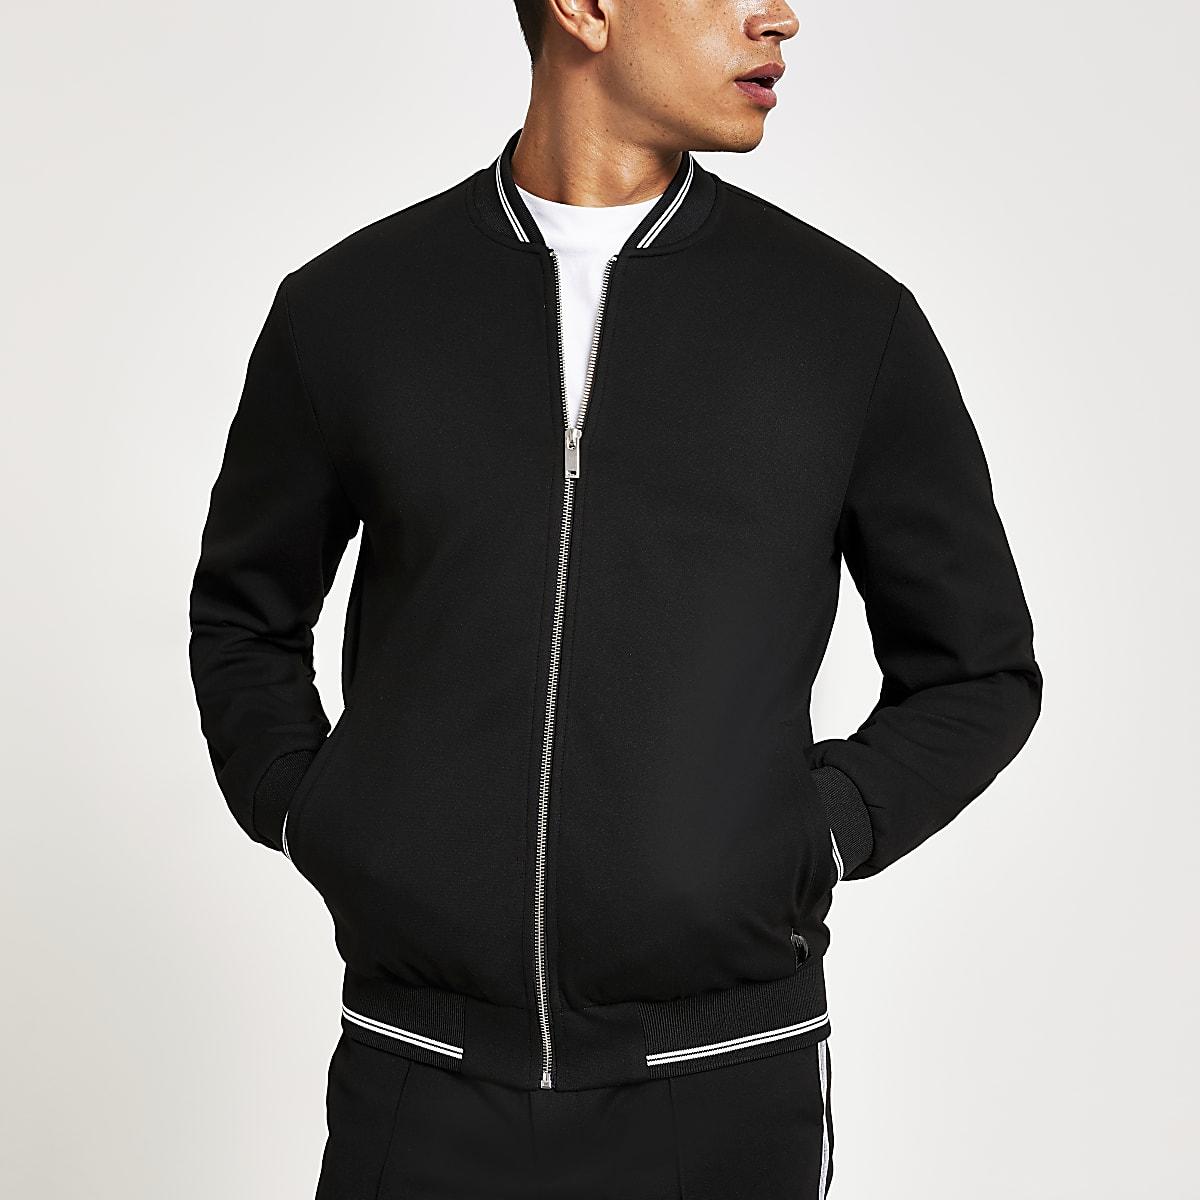 Black skinny fit bomber jacket